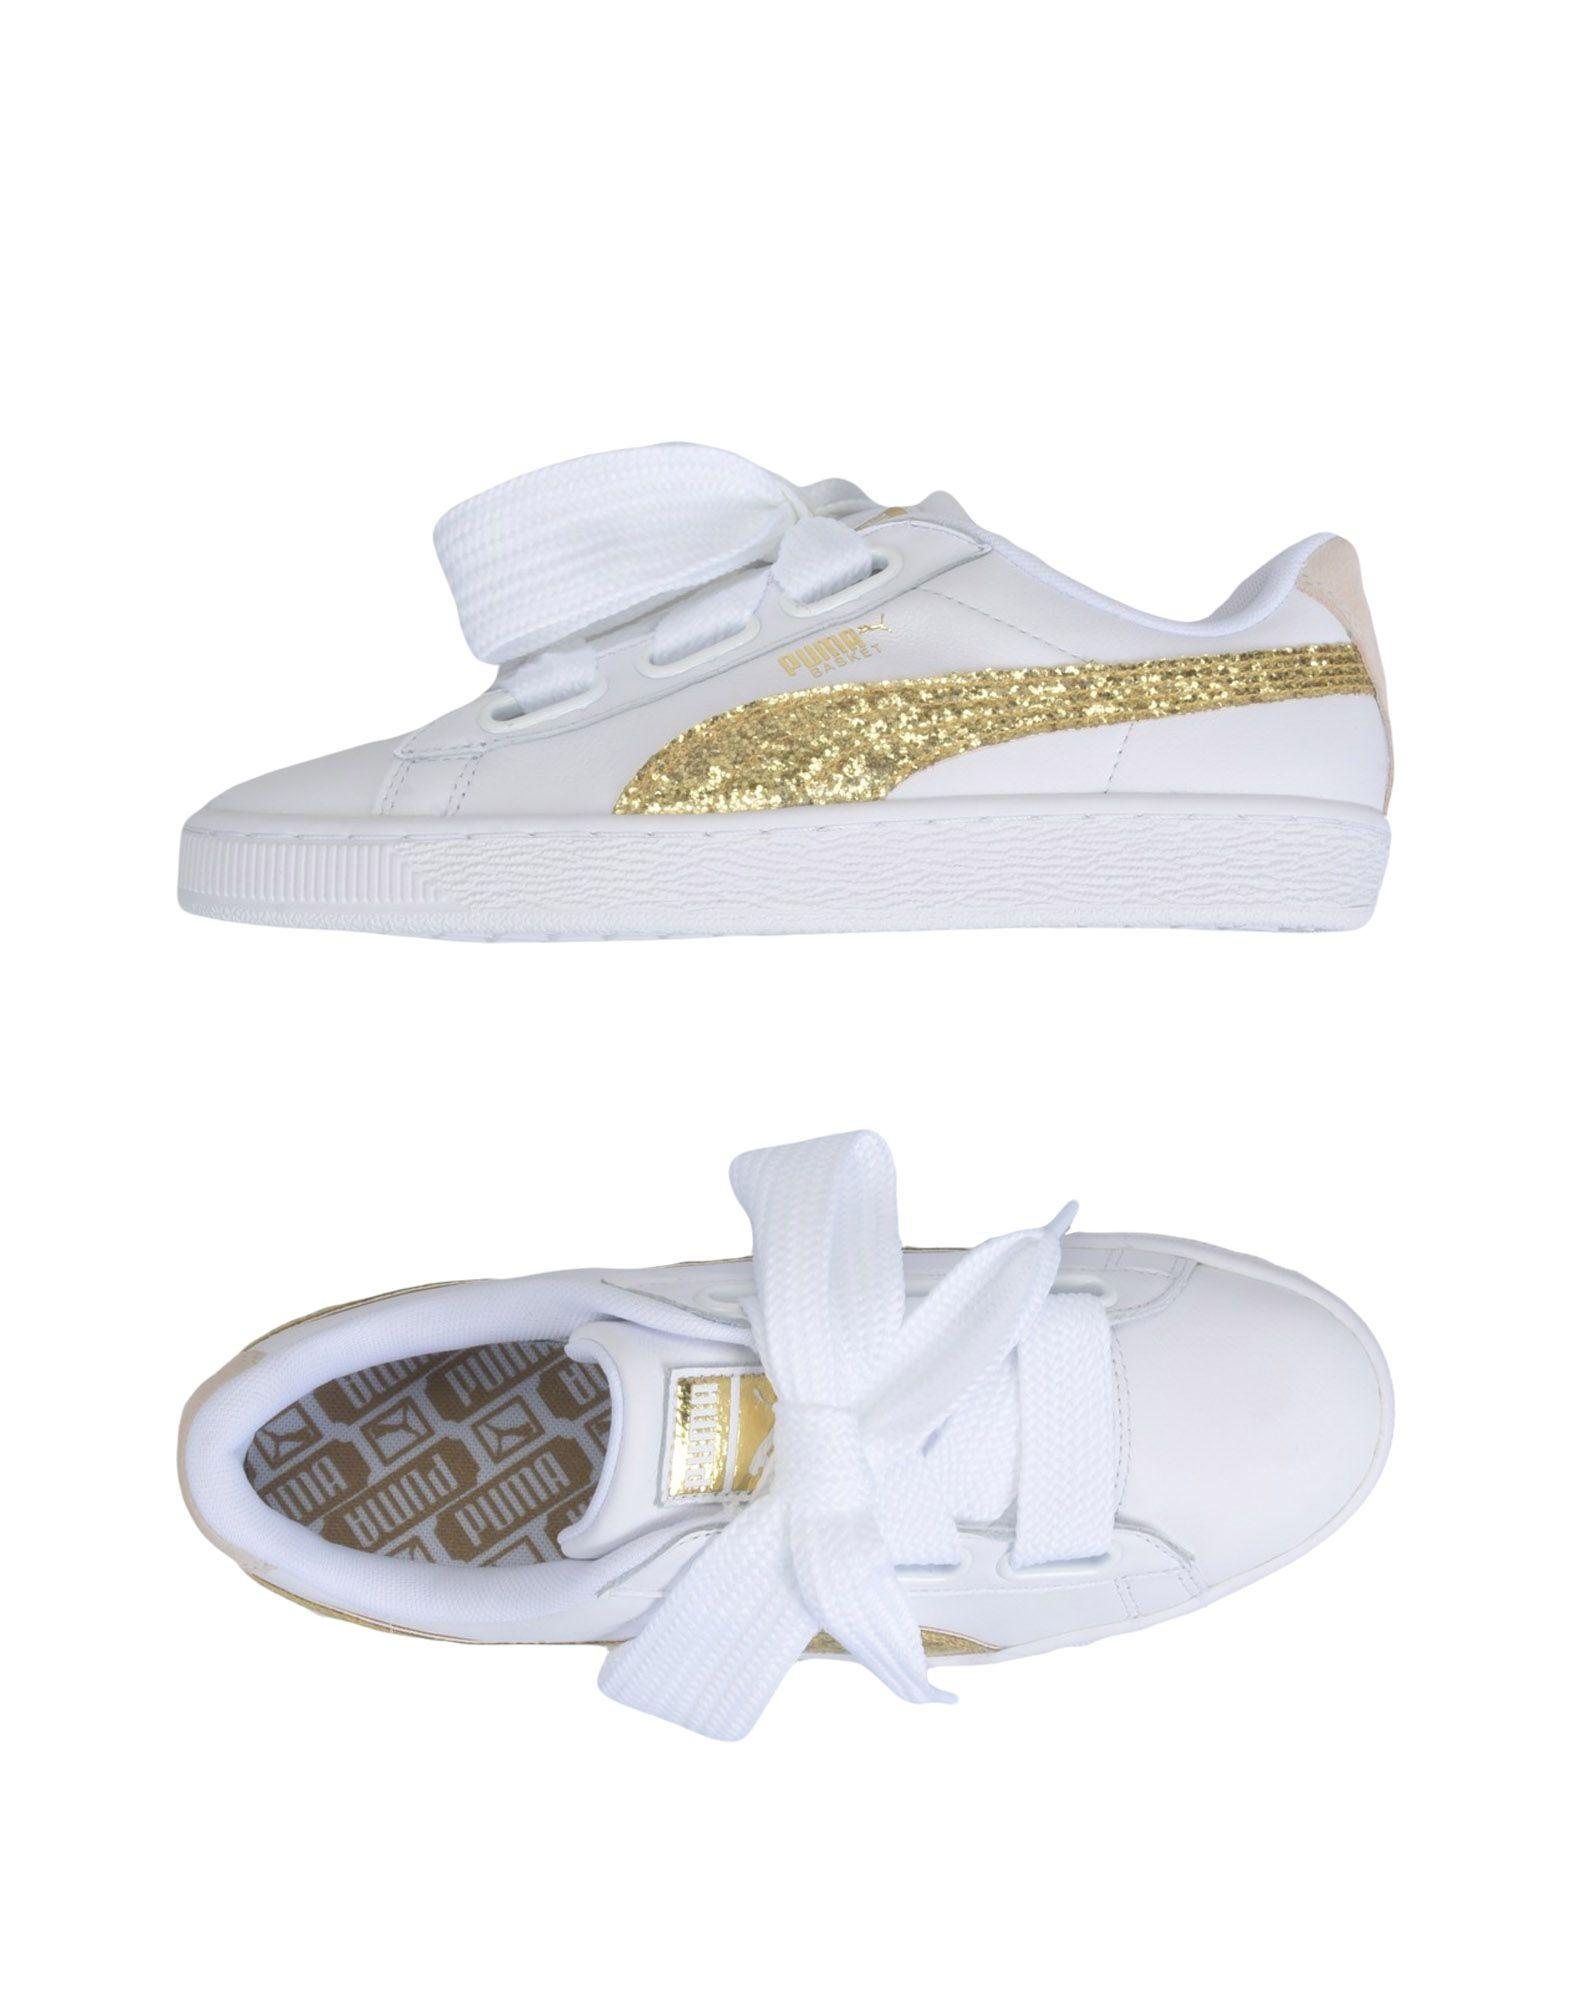 e860c4a670ba1b Puma Women s Basket Heart Glitter Casual Sneakers From Finish Line In White